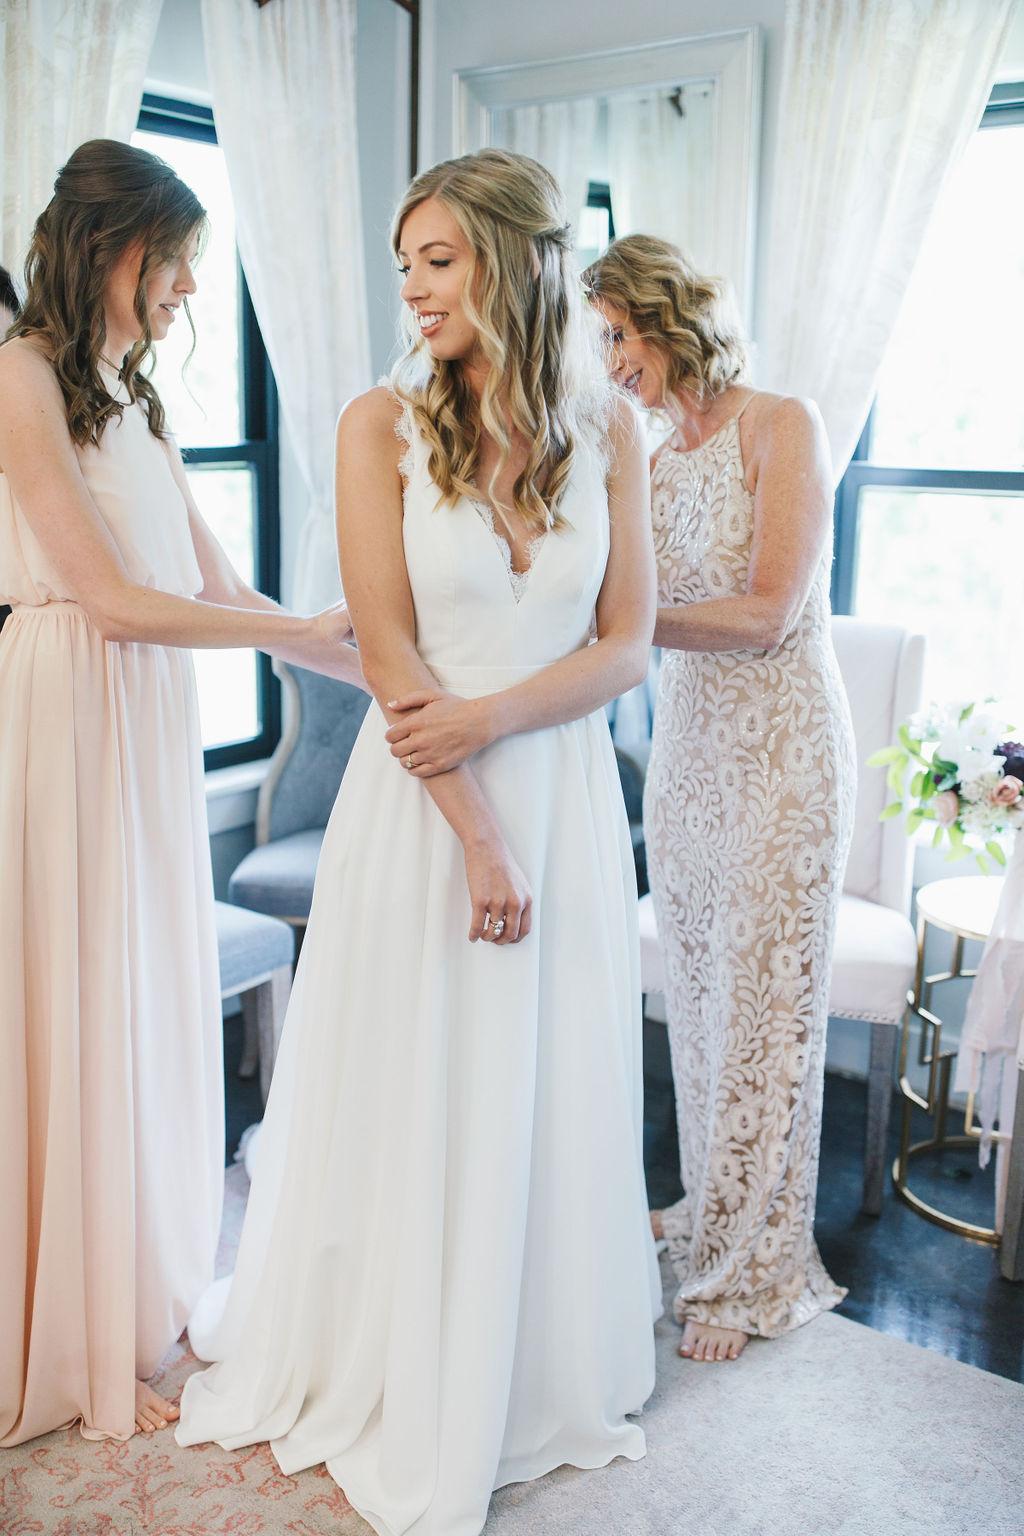 Bixby White Barn Tulsa Wedding 13.jpg